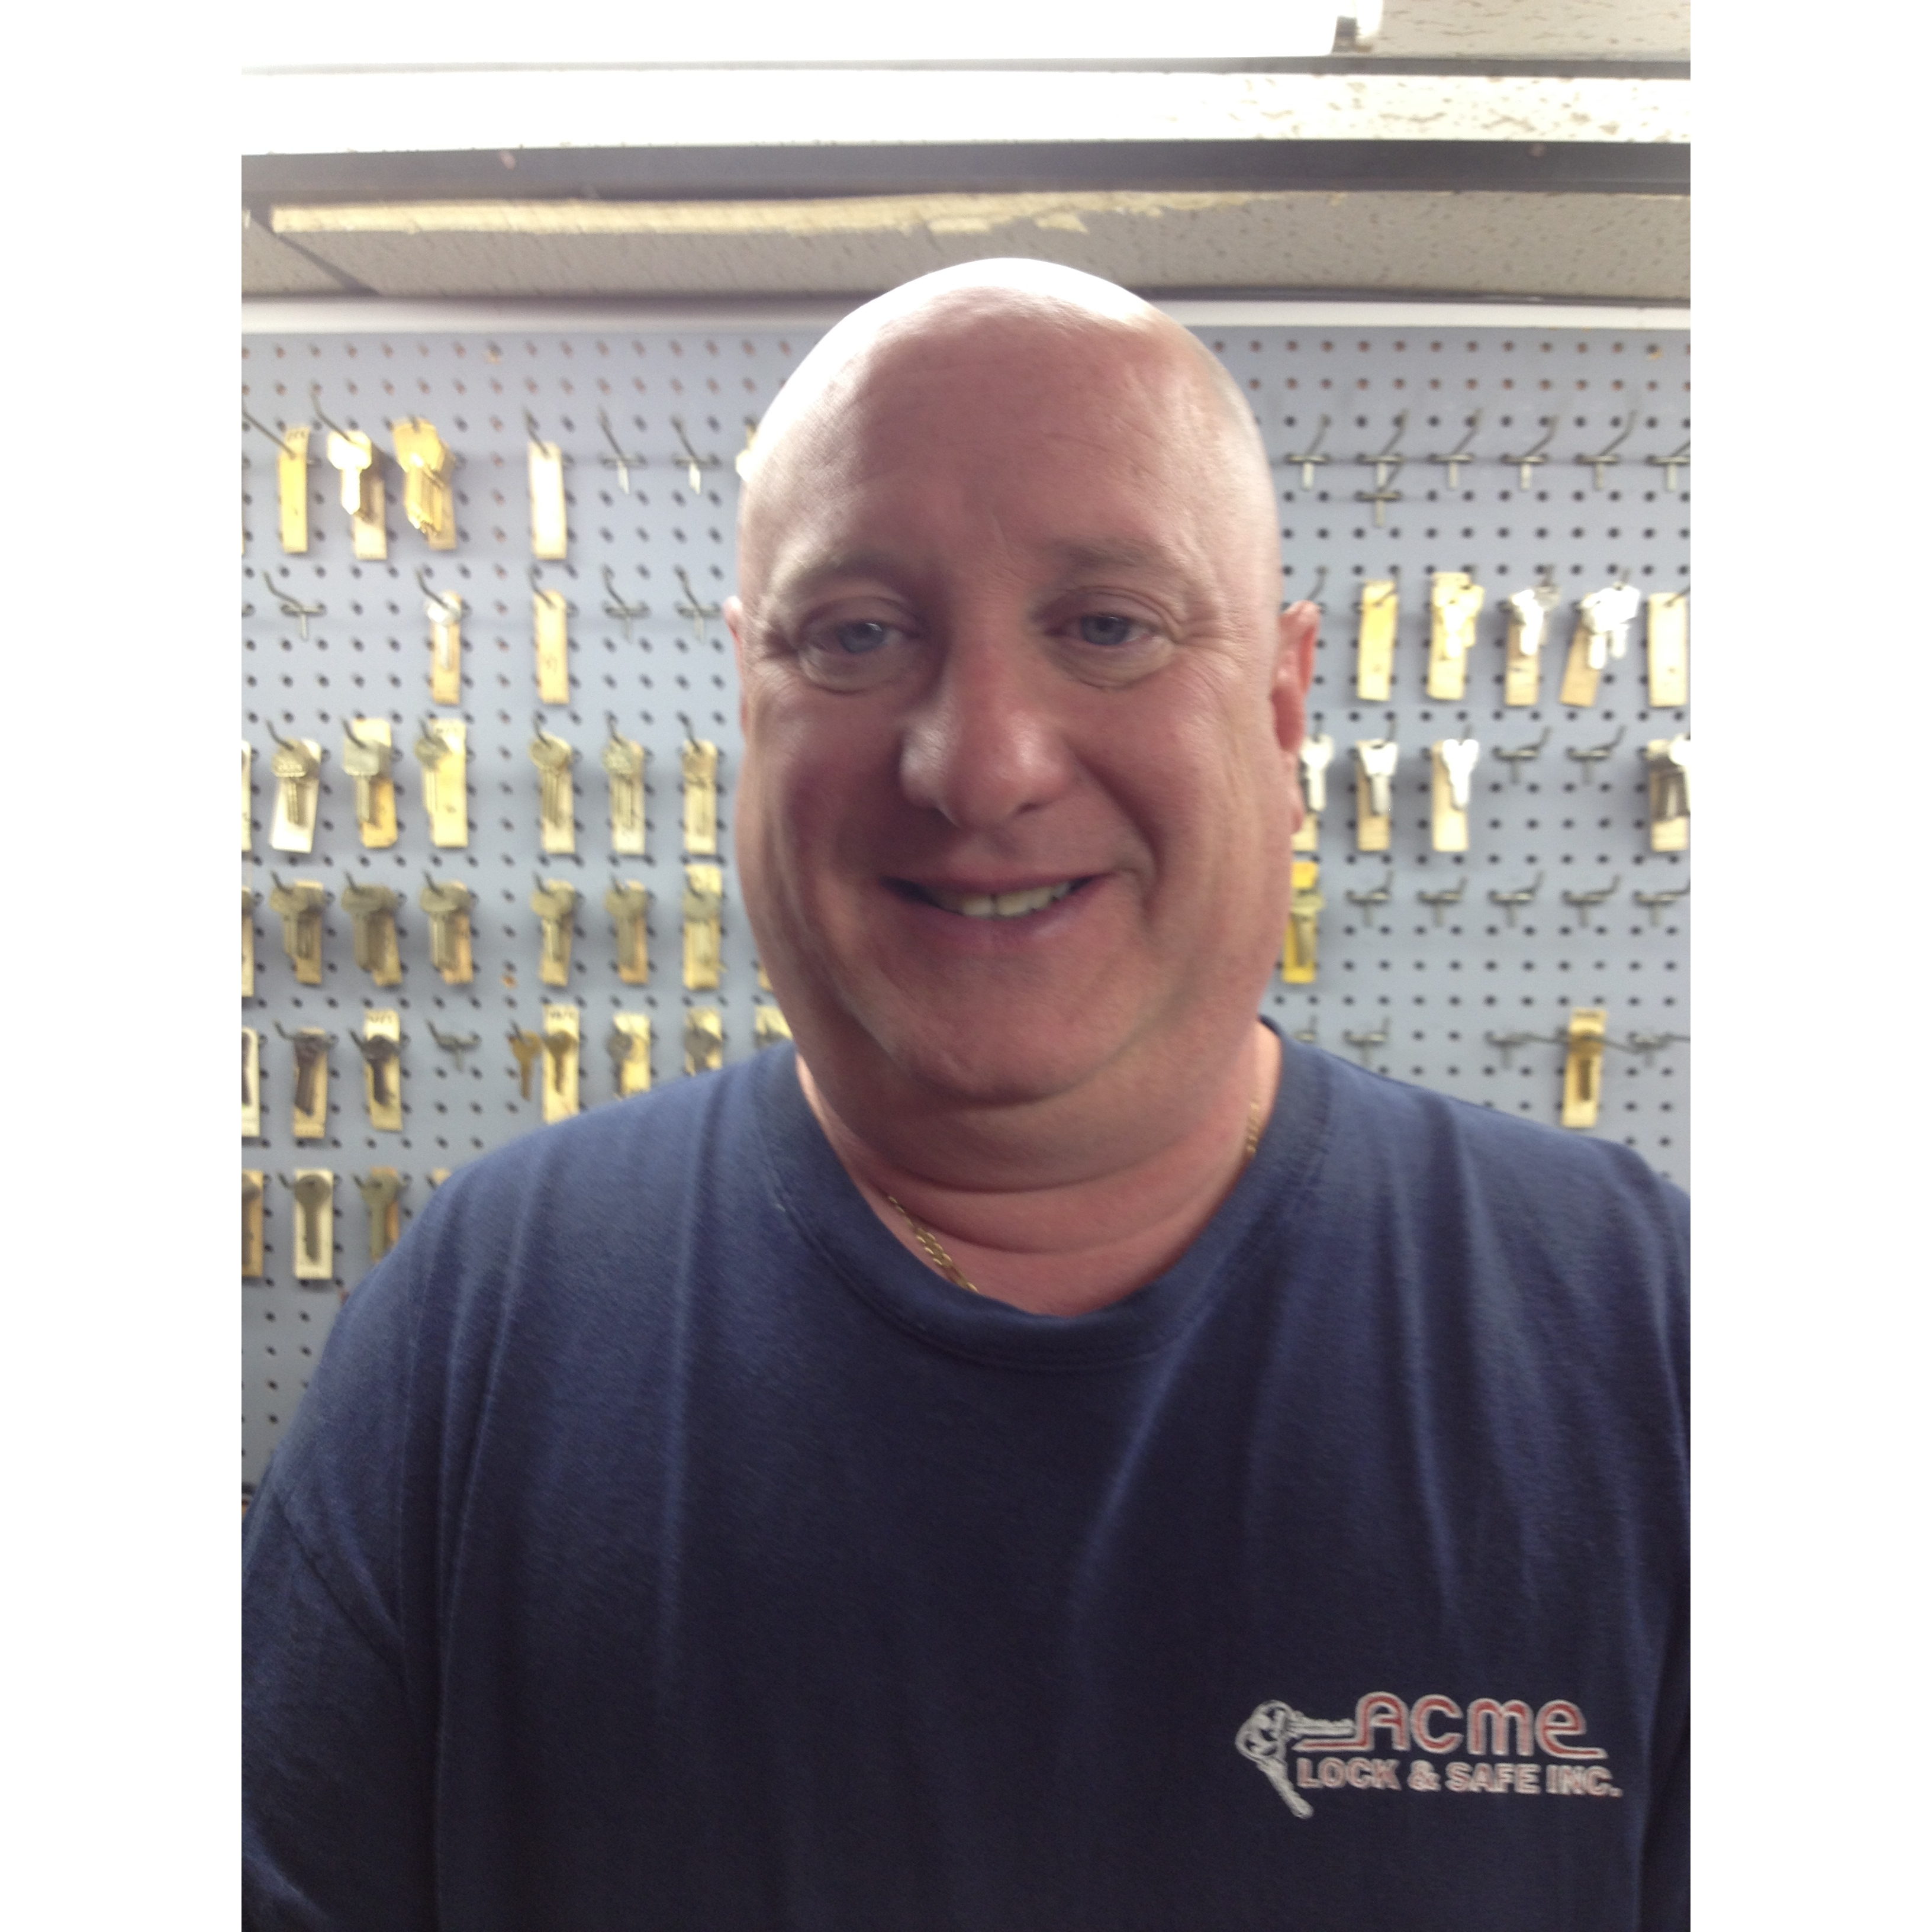 Acme Lock & Safe,Inc image 0